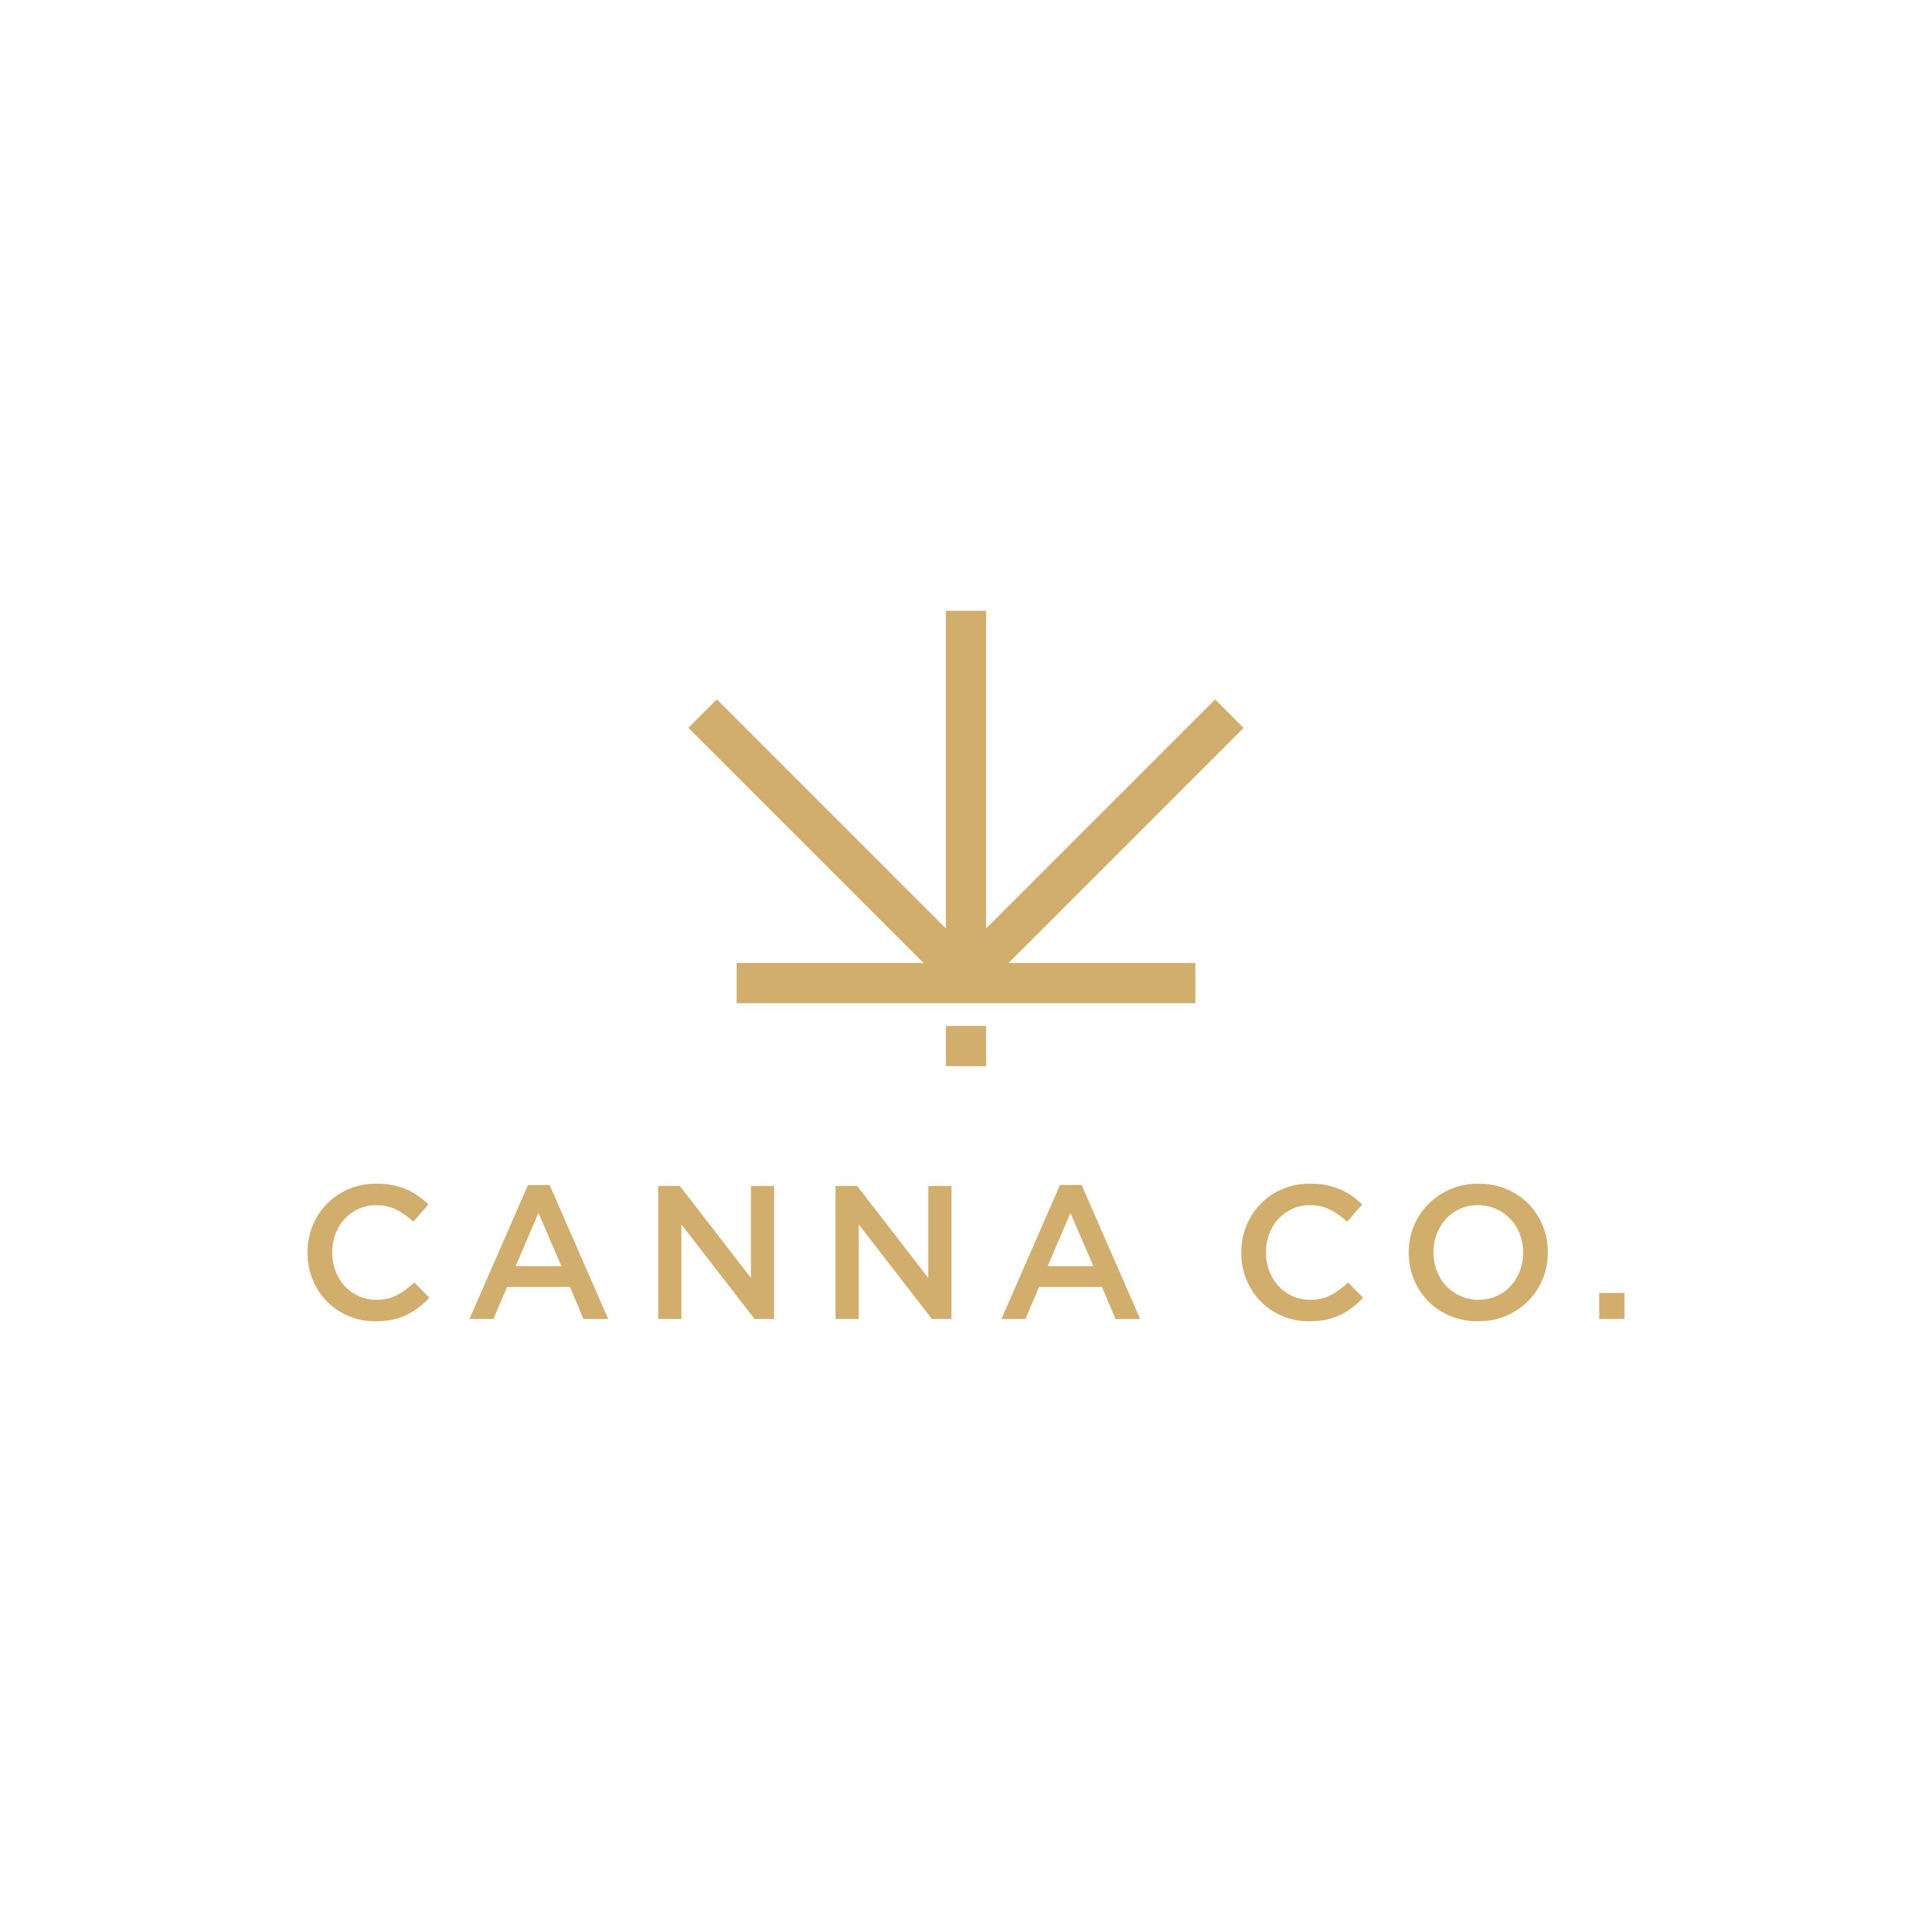 Connoisseur cannabis company needs minimalist logo